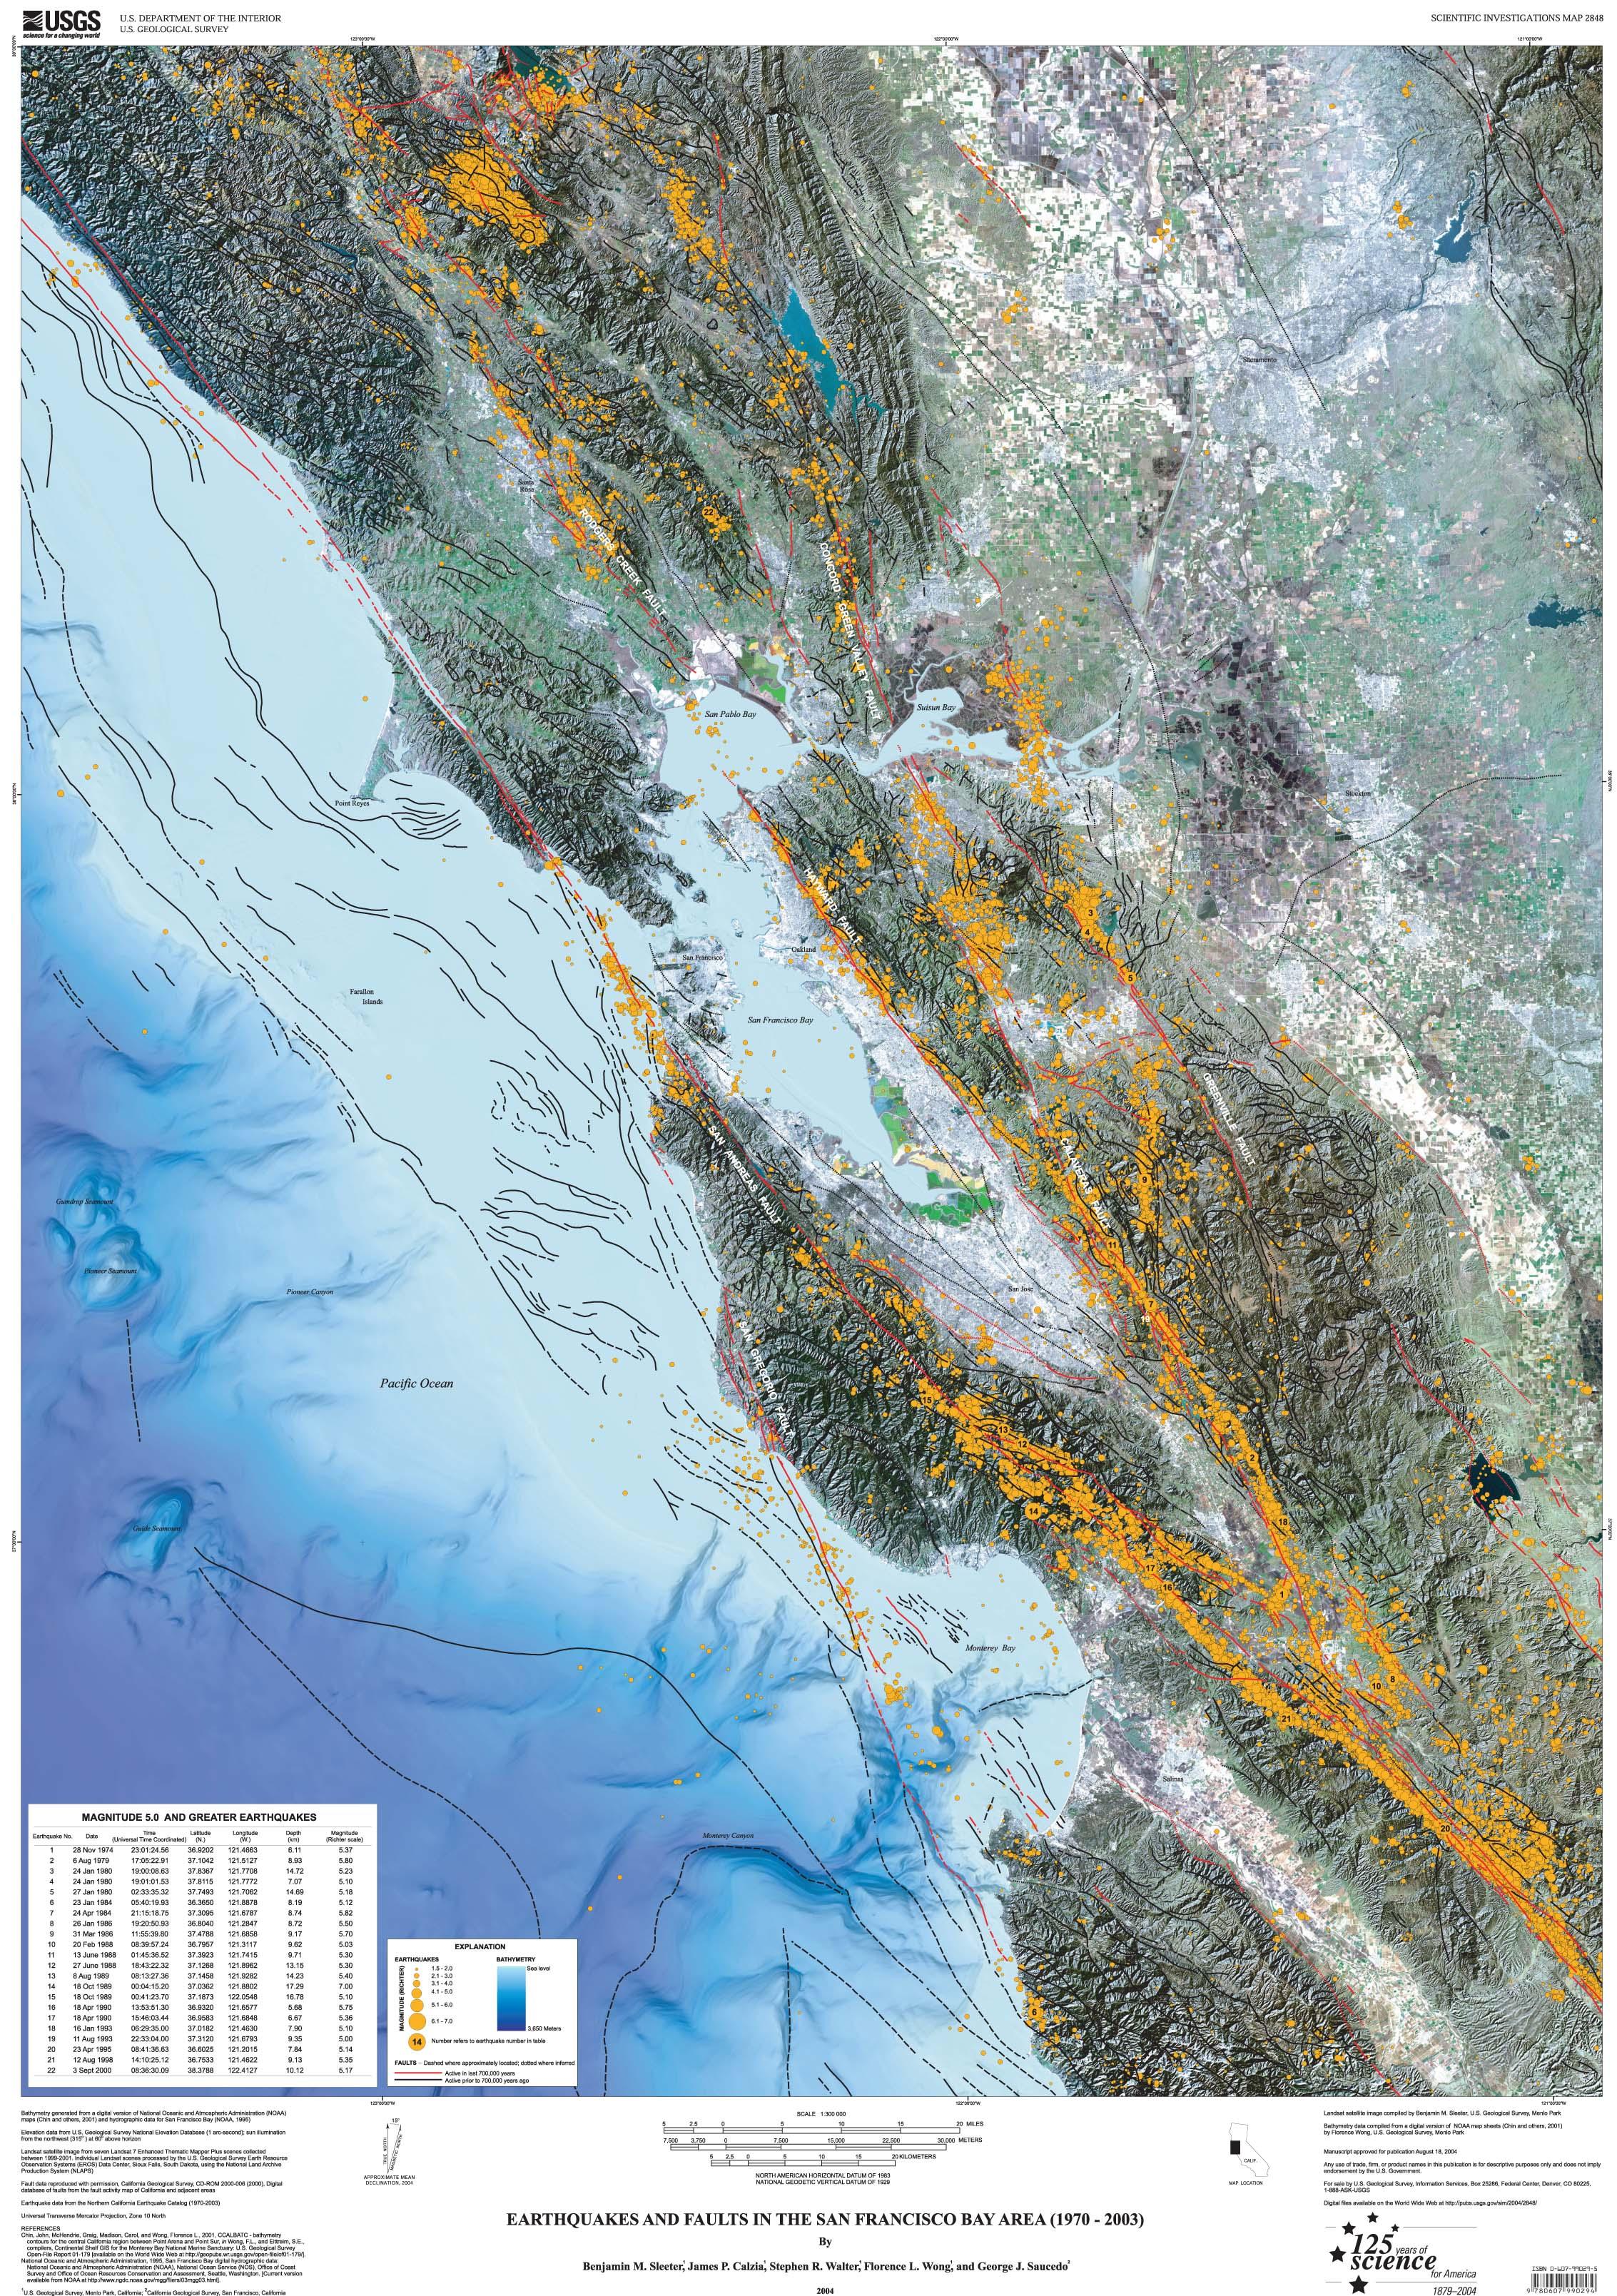 Seismic Hazards Maps for the San Francisco Bay Area | Earthquake Safety